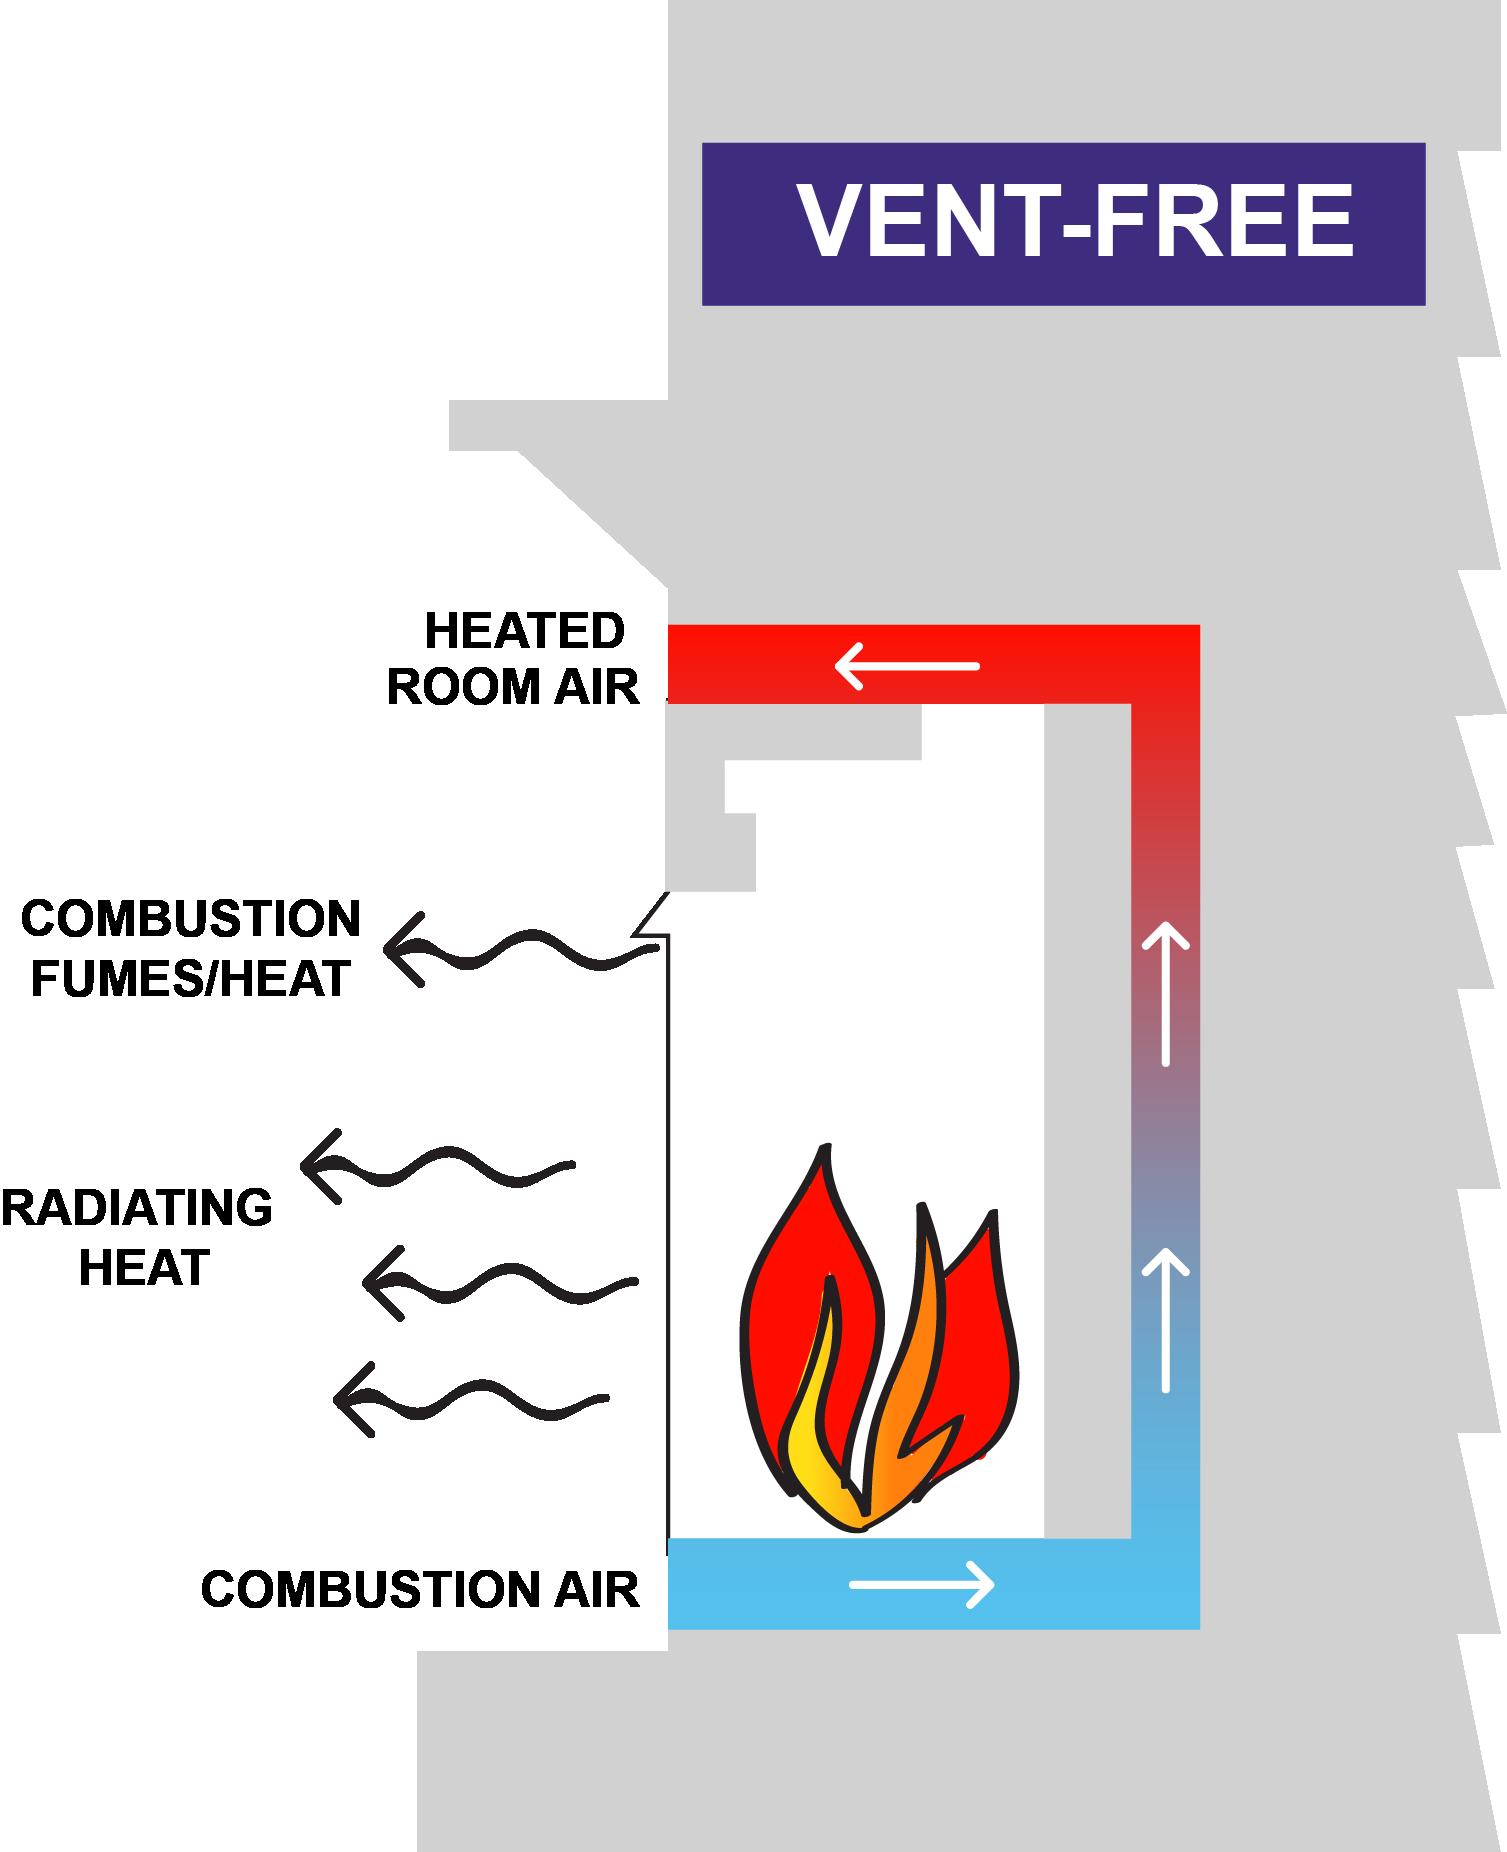 vent free graphic